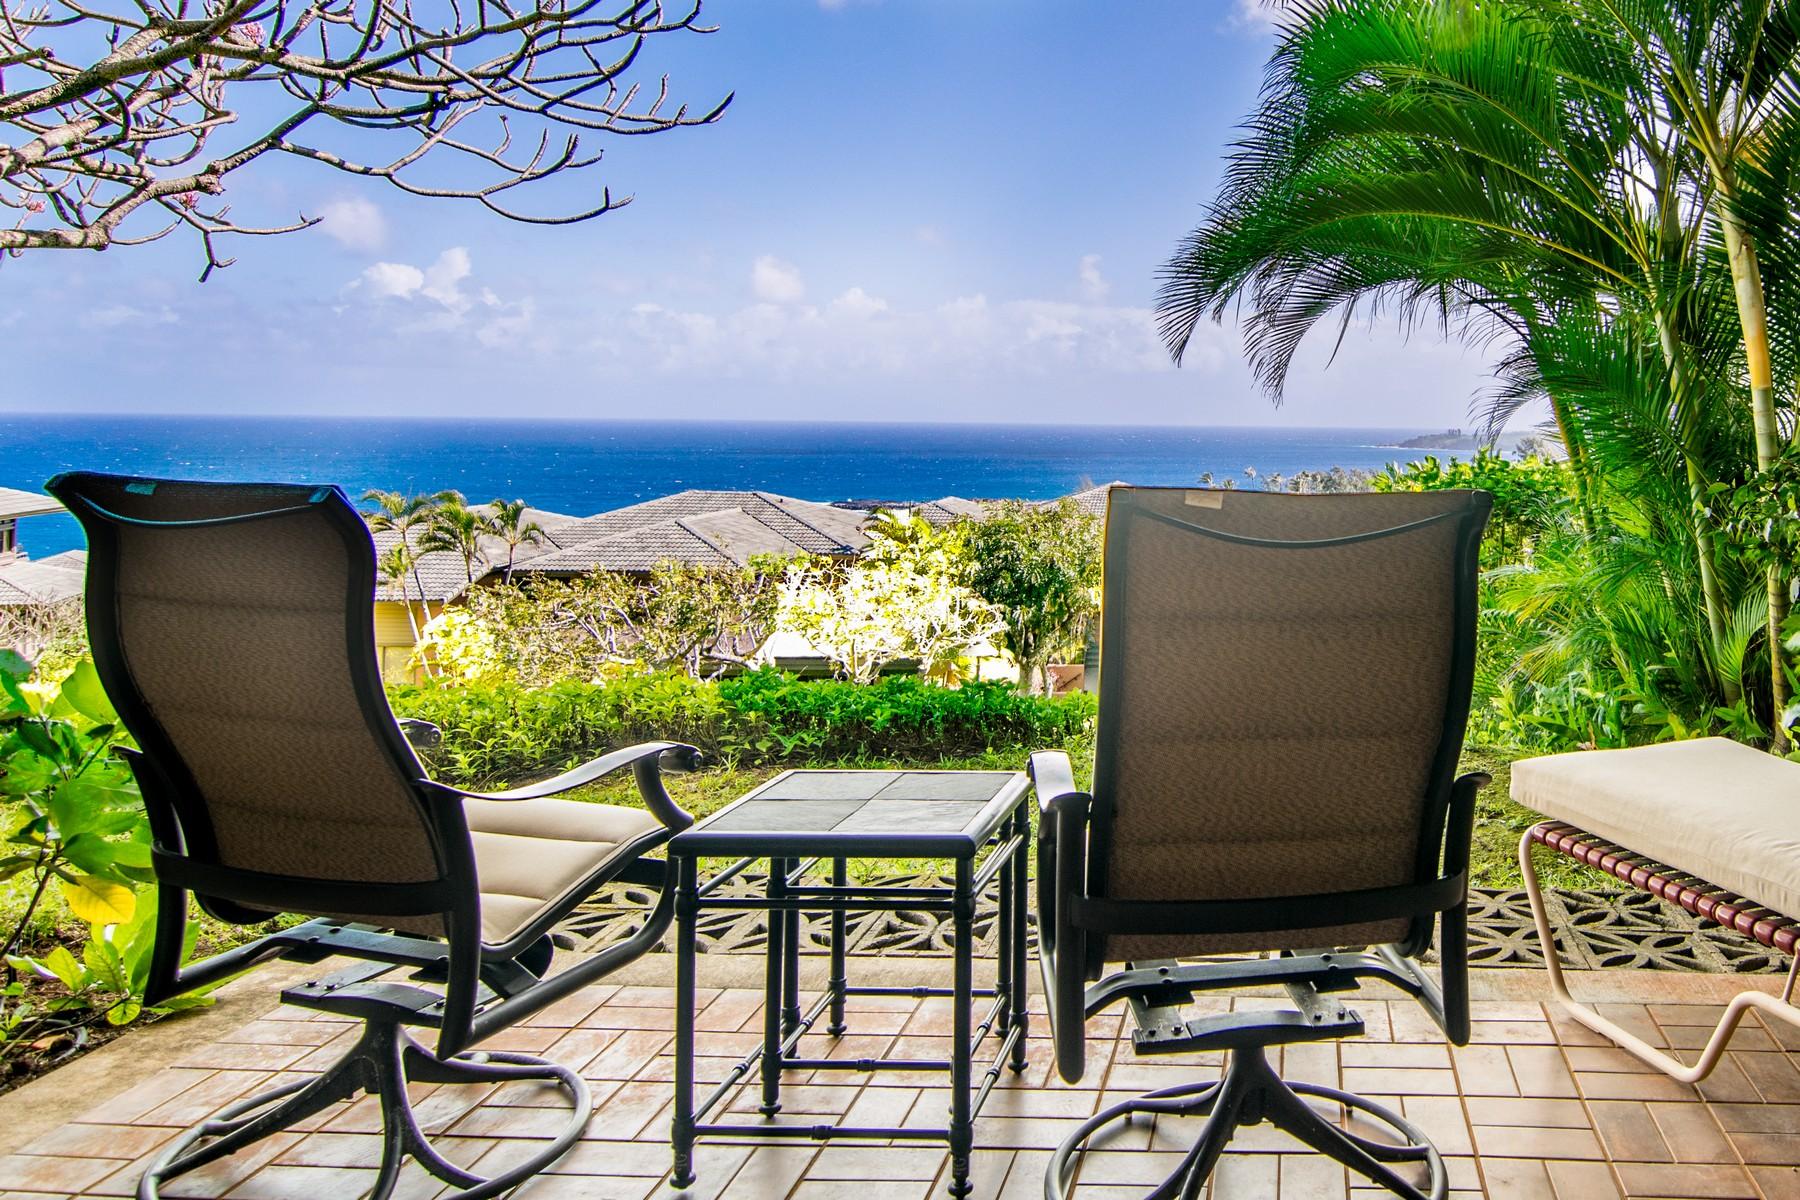 Condominium for Sale at Ocean View Villa In Kapalua, Maui 100 Ridge Road, Kapalua Ridge Villas 1513-15 Kapalua, Hawaii, 96761 United States